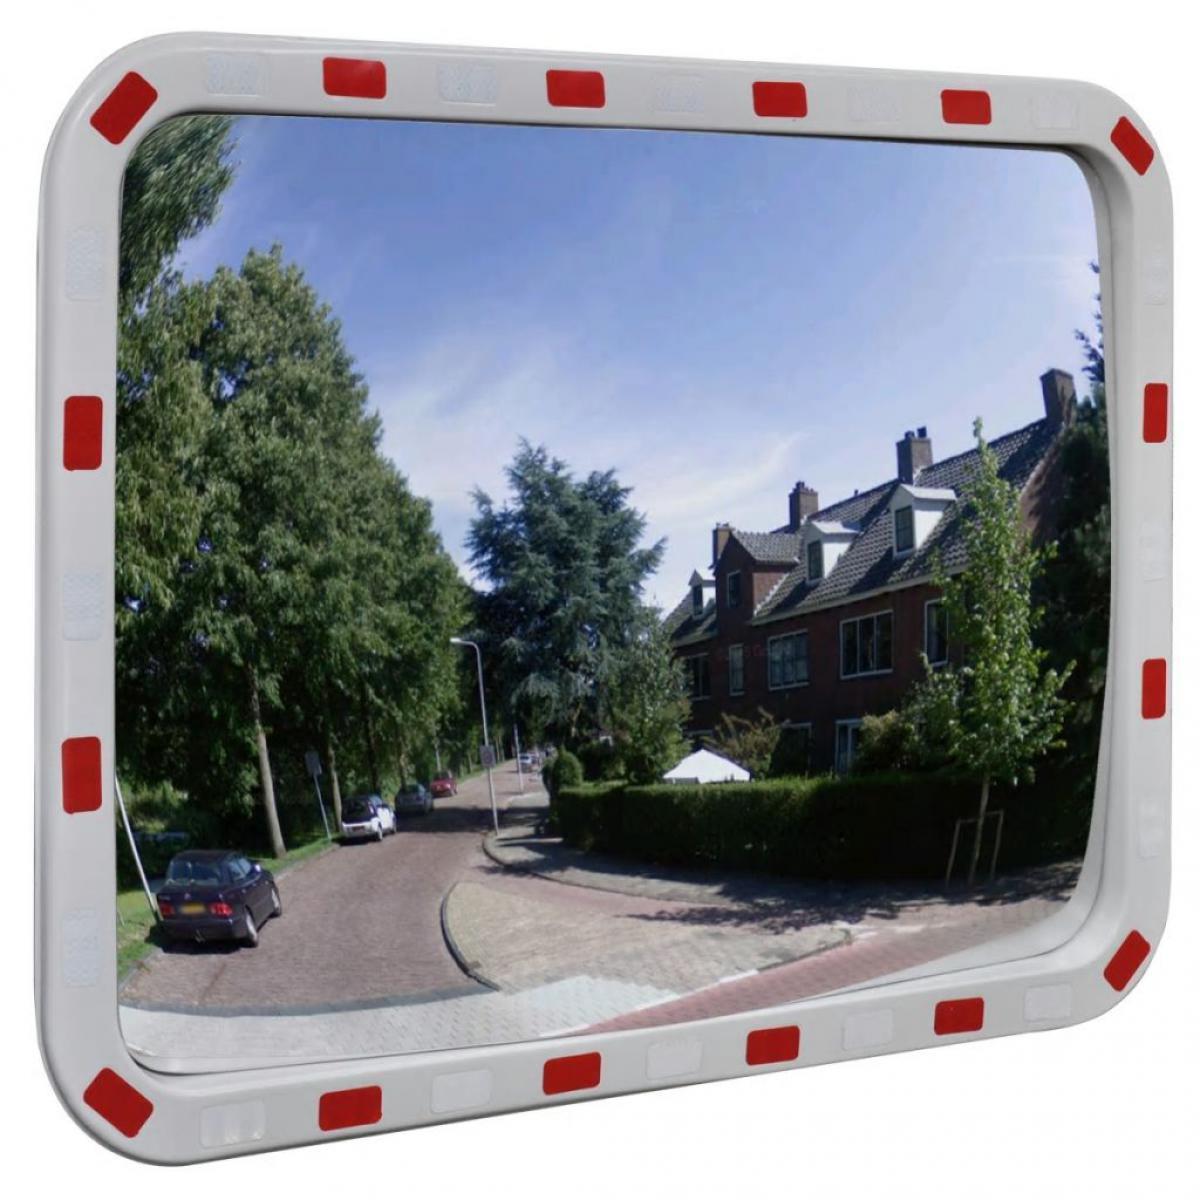 Vidaxl vidaXL Miroir de trafic convexe rectangulaire 60x80cm et réflecteurs